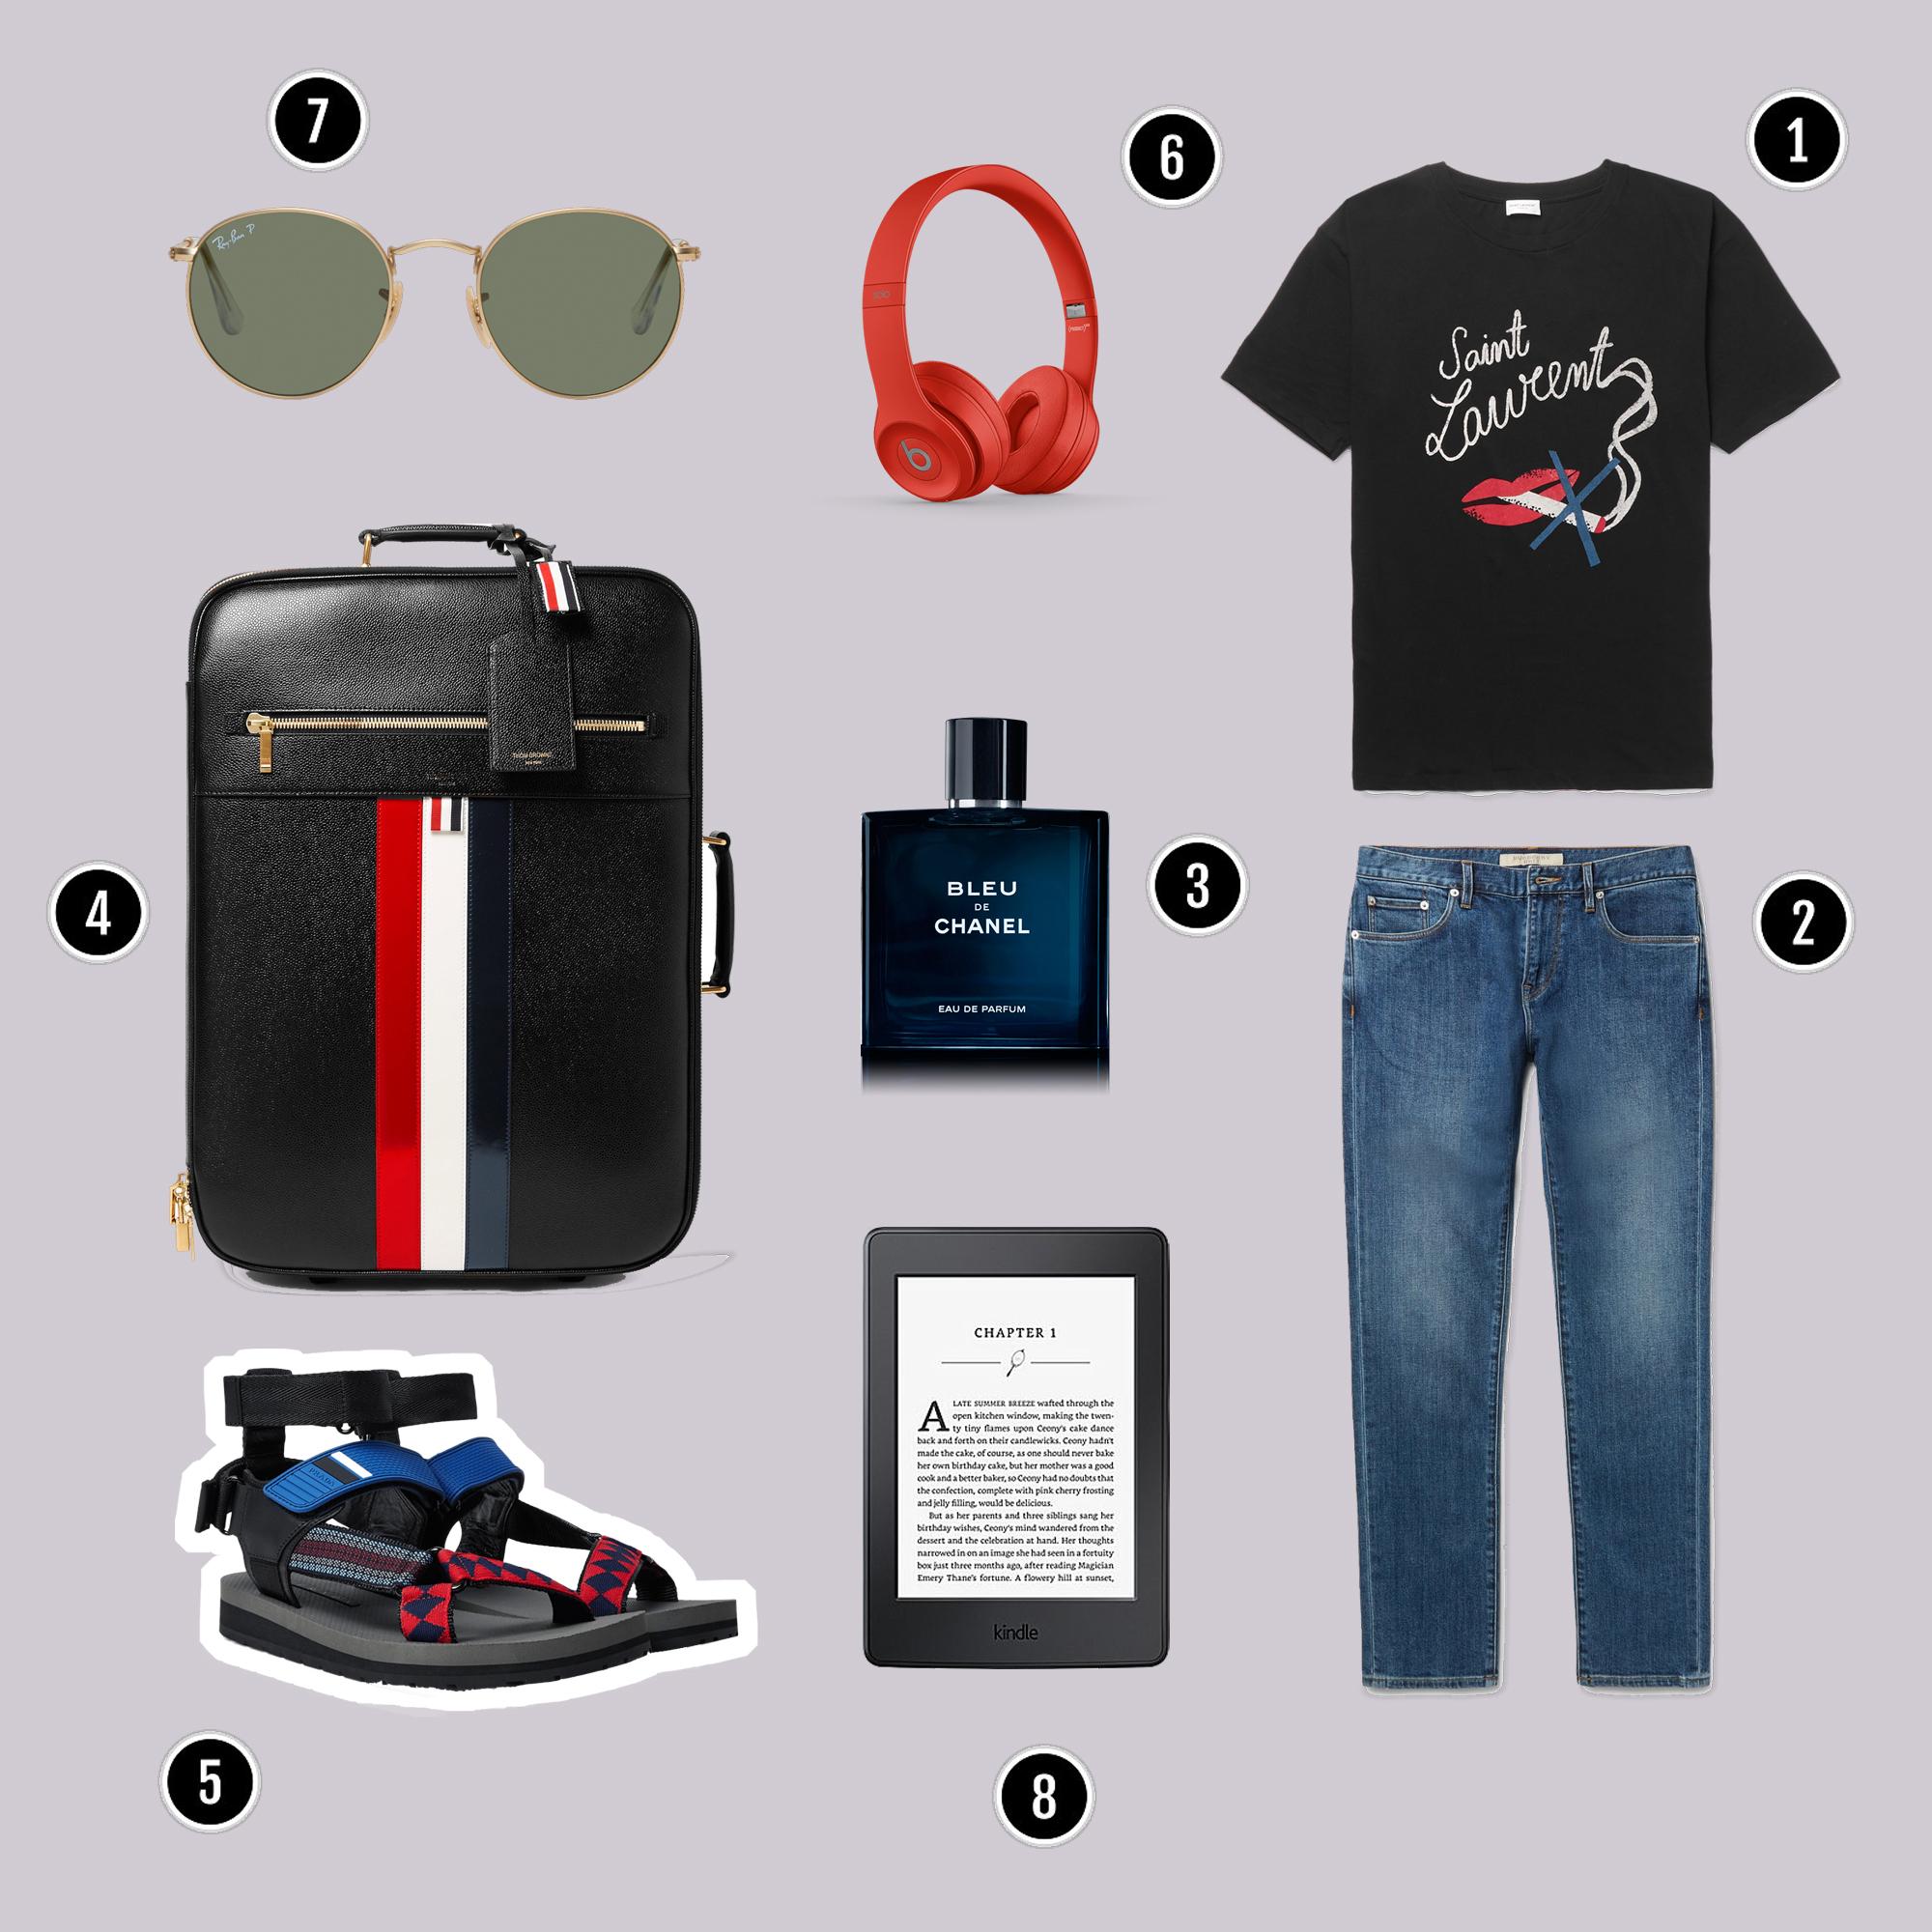 1.Áo : Saint Laurent / 2.Quần : Burberry / 3.Nước hoa : Chanel / 4.Vali : Thom Browne / 5.Sandals : Fendi / 6.Headphones : Beats / 7.Kính : Rayban / 8.Máy đọc sách : Kindle